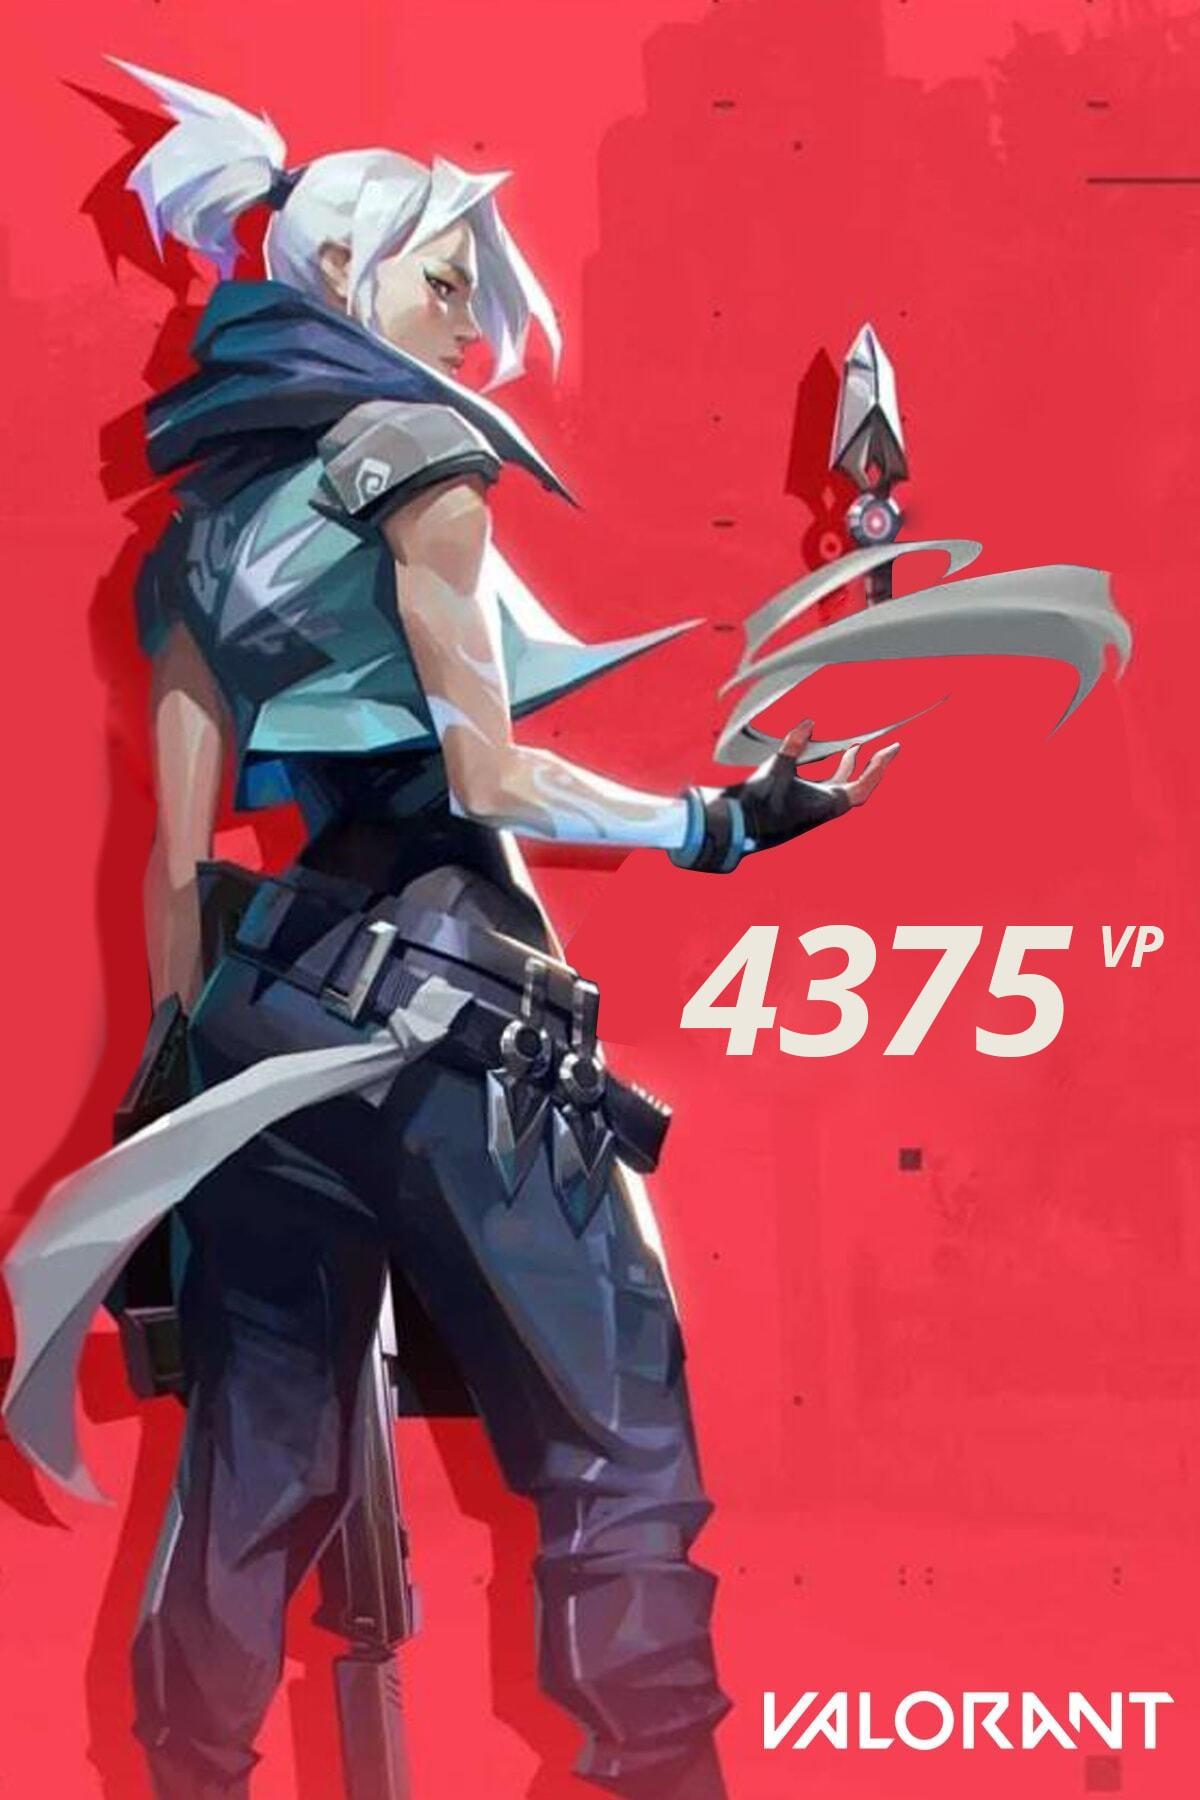 4375 VP Valorant Points TR